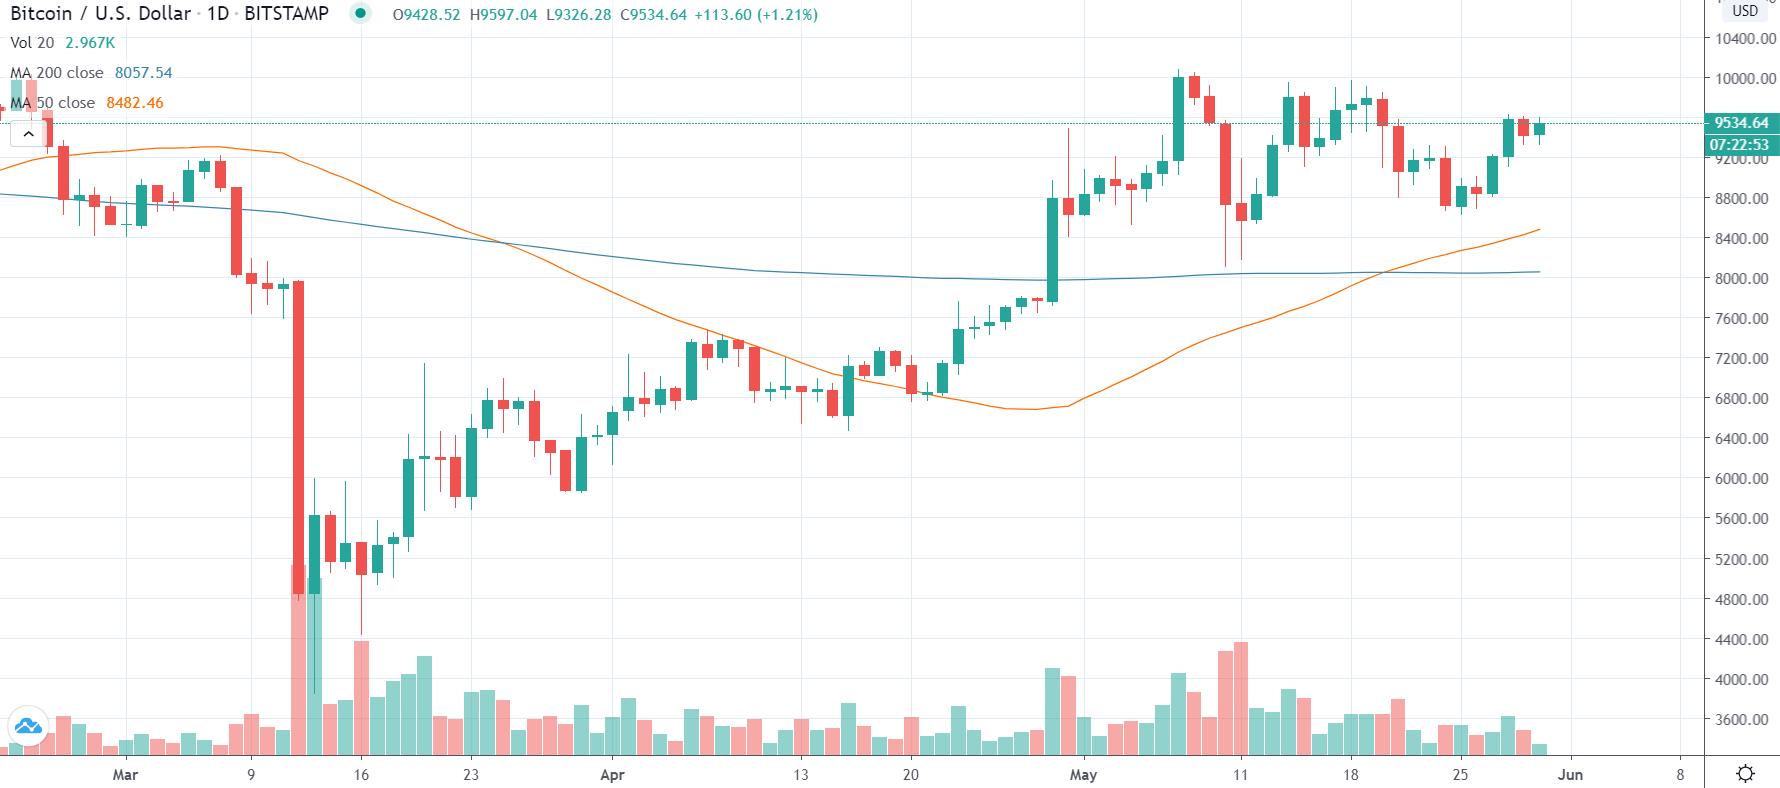 , Ethereum na koni – 15% zisk za tri dni! Bude nasledovať Bitcoin breakout nad 10k?